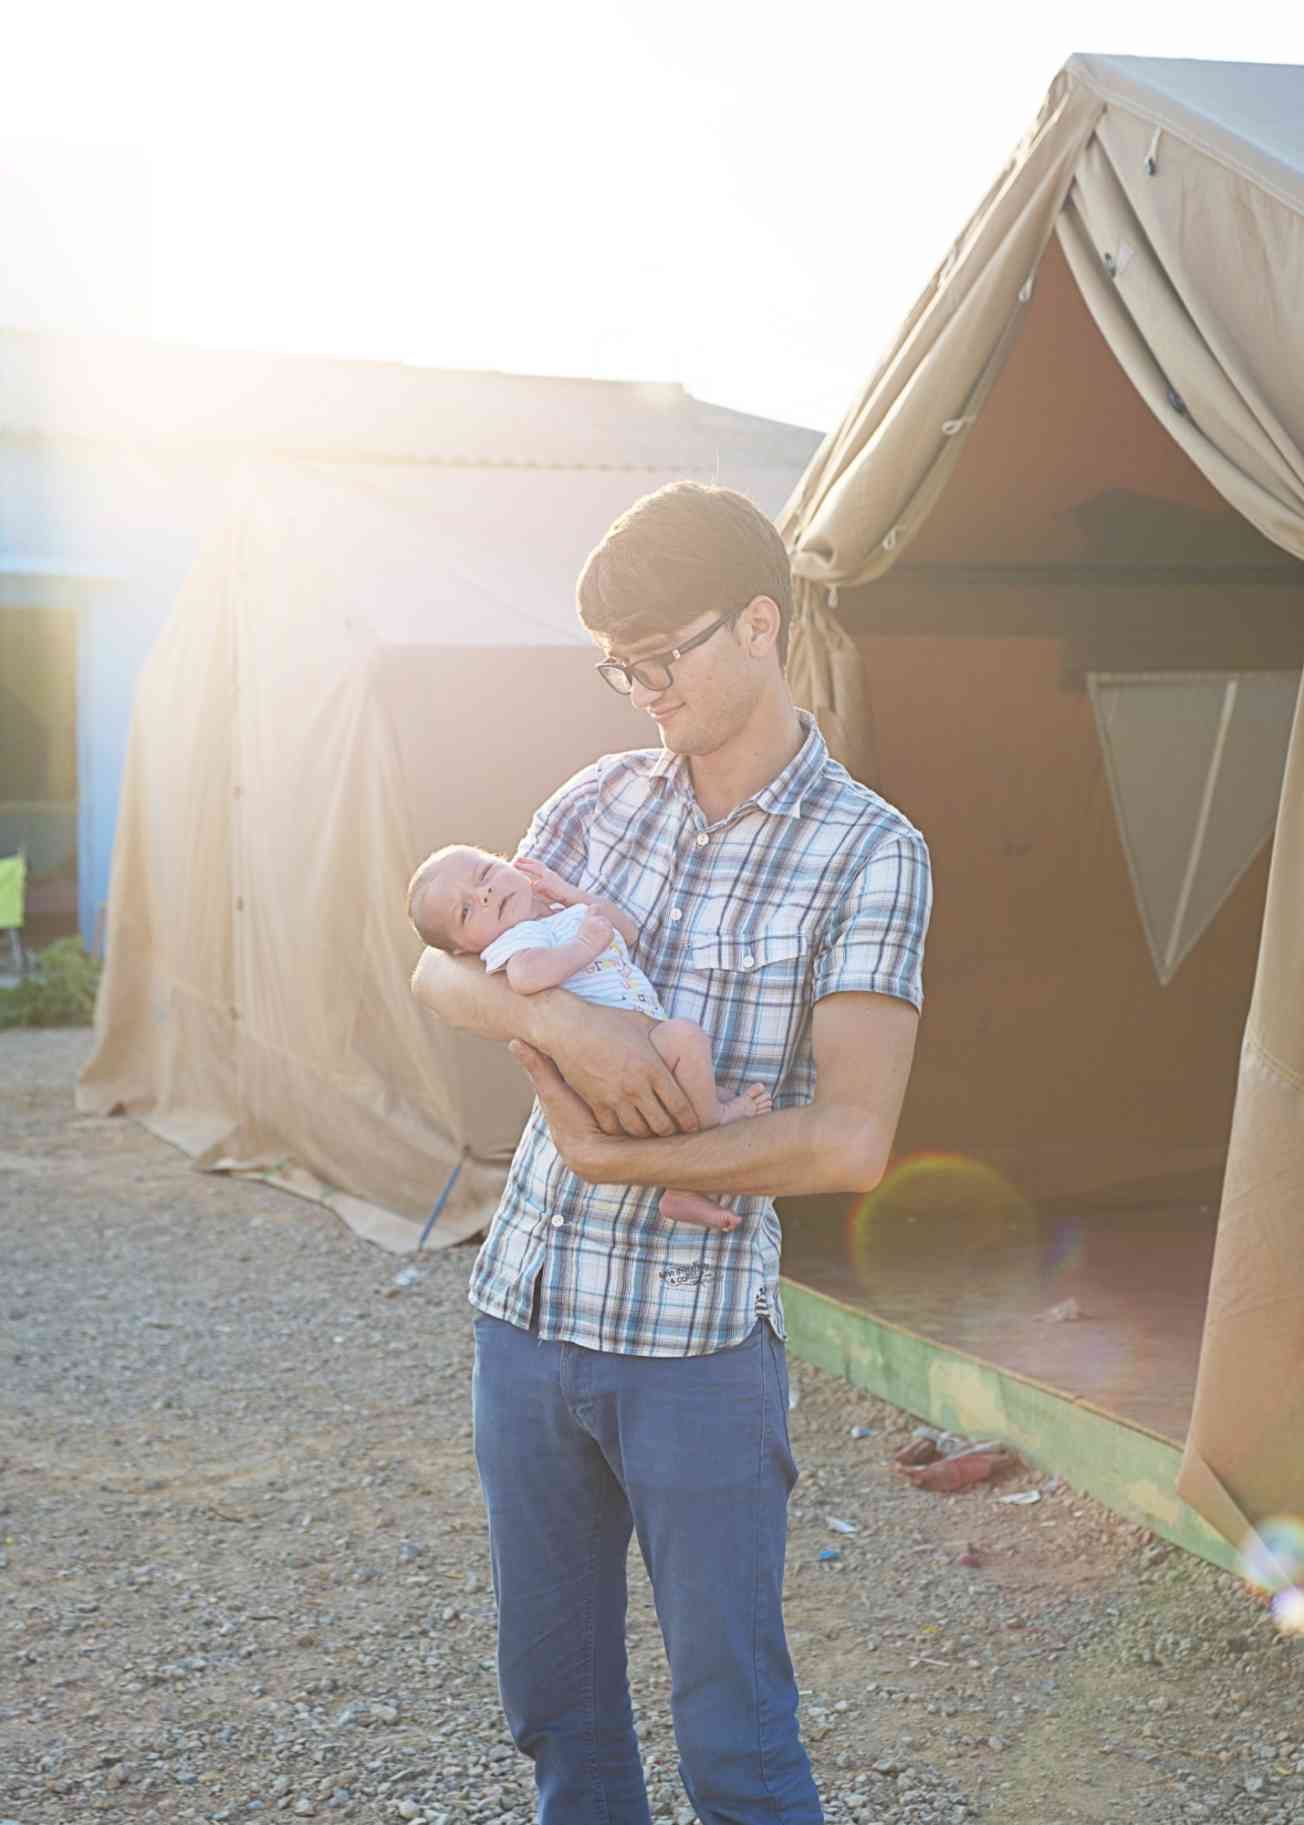 Ahmad and his child 2